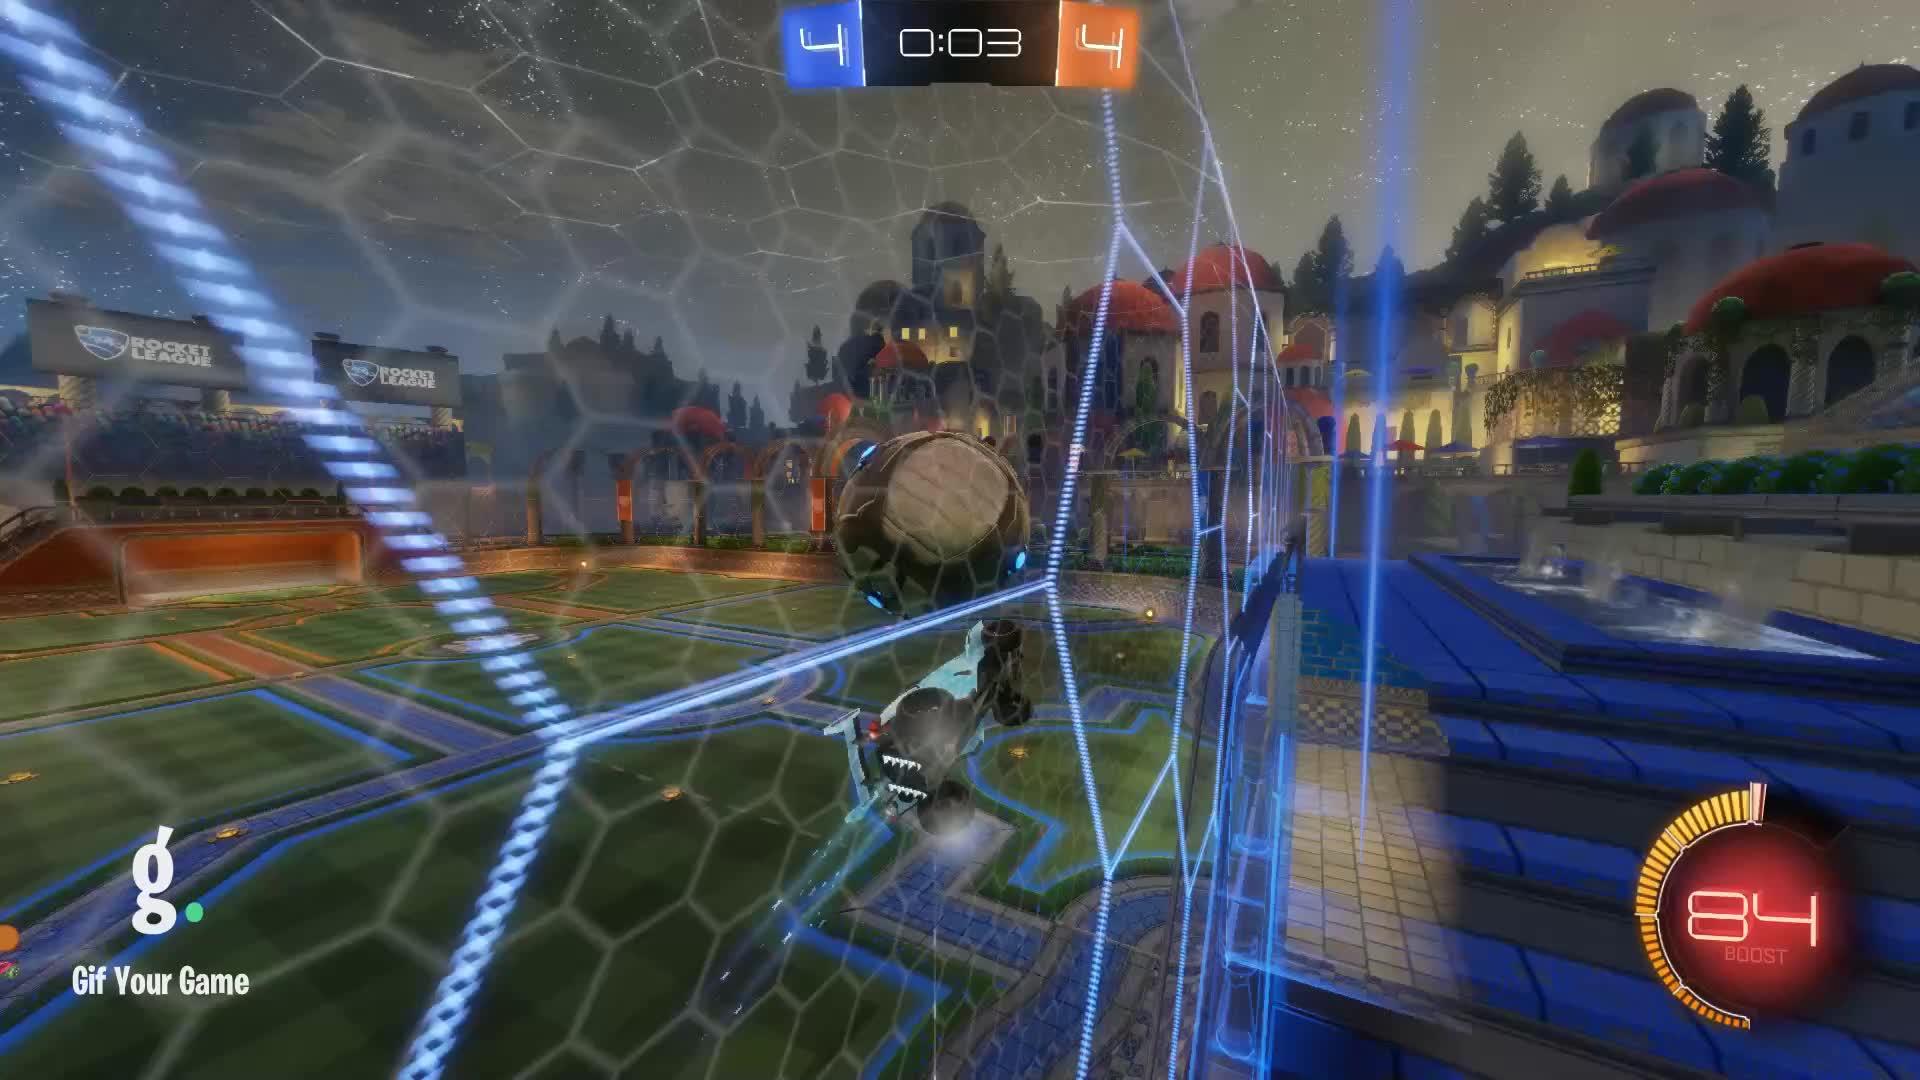 Gif Your Game, GifYourGame, Goal, Obi, Rocket League, RocketLeague, Goal 9: Obi GIFs